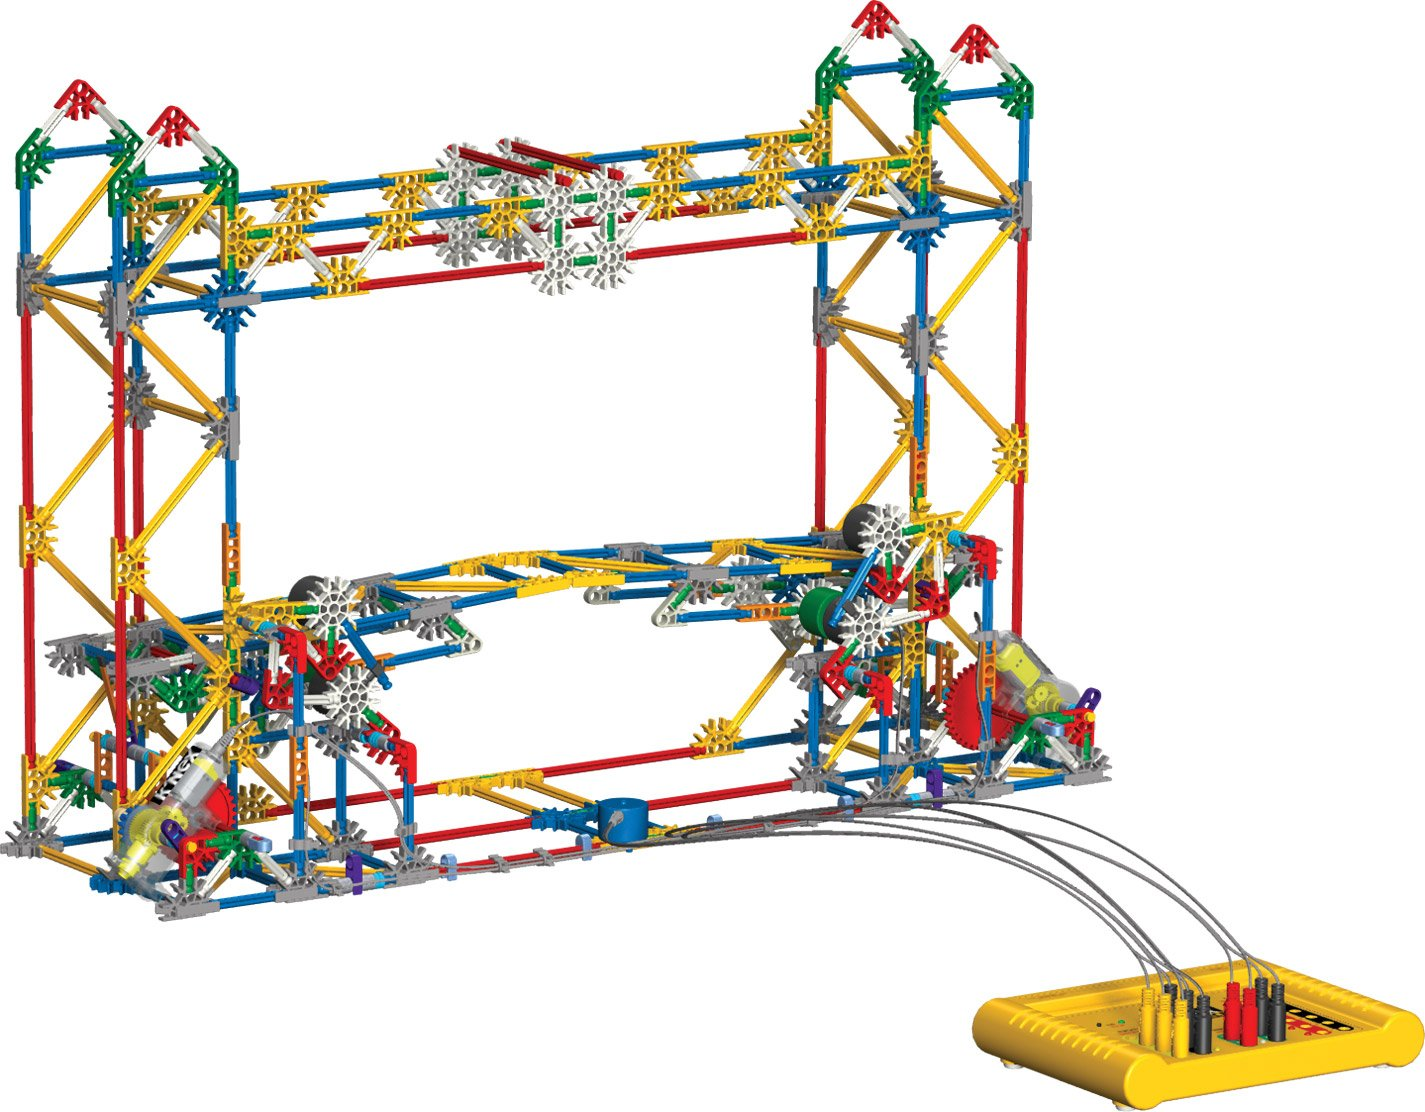 Knex Bridge Building Instructions